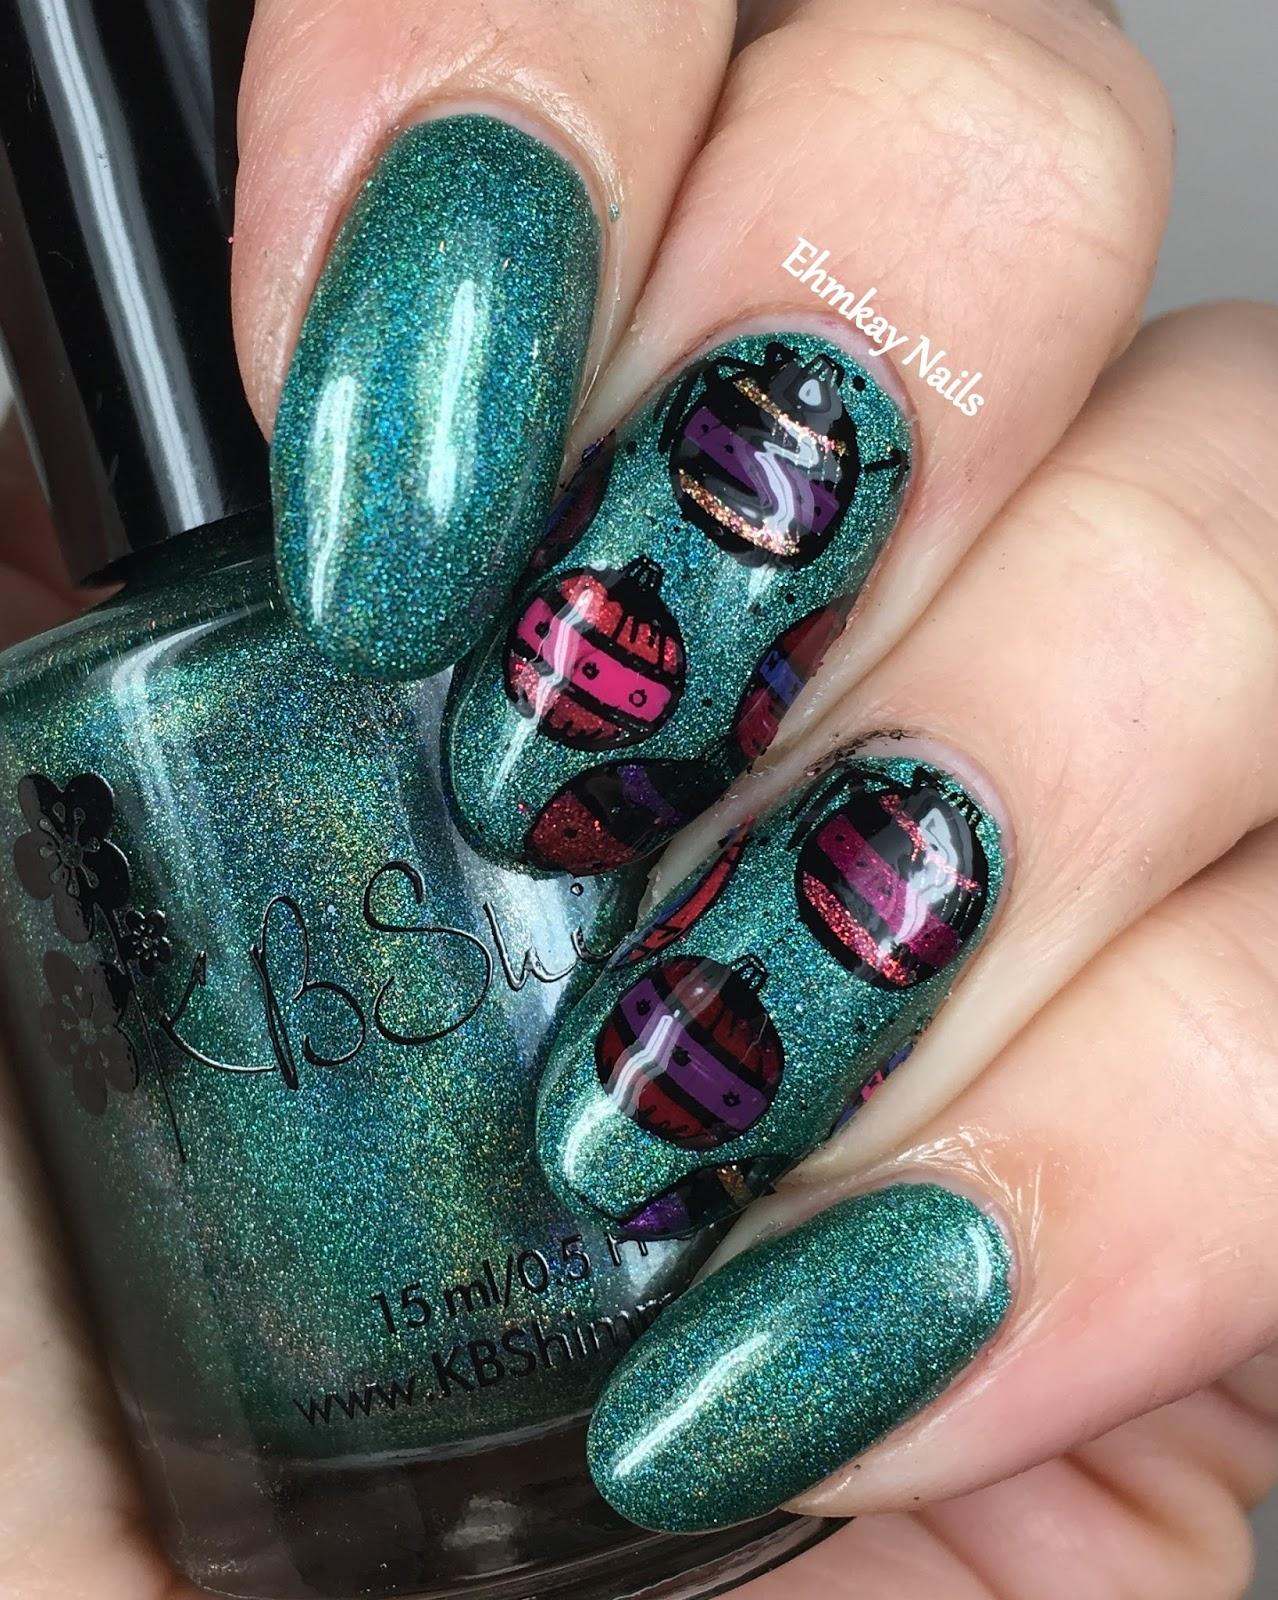 Ehmkay Nails: Winter Nail Art Challenge: Decorations